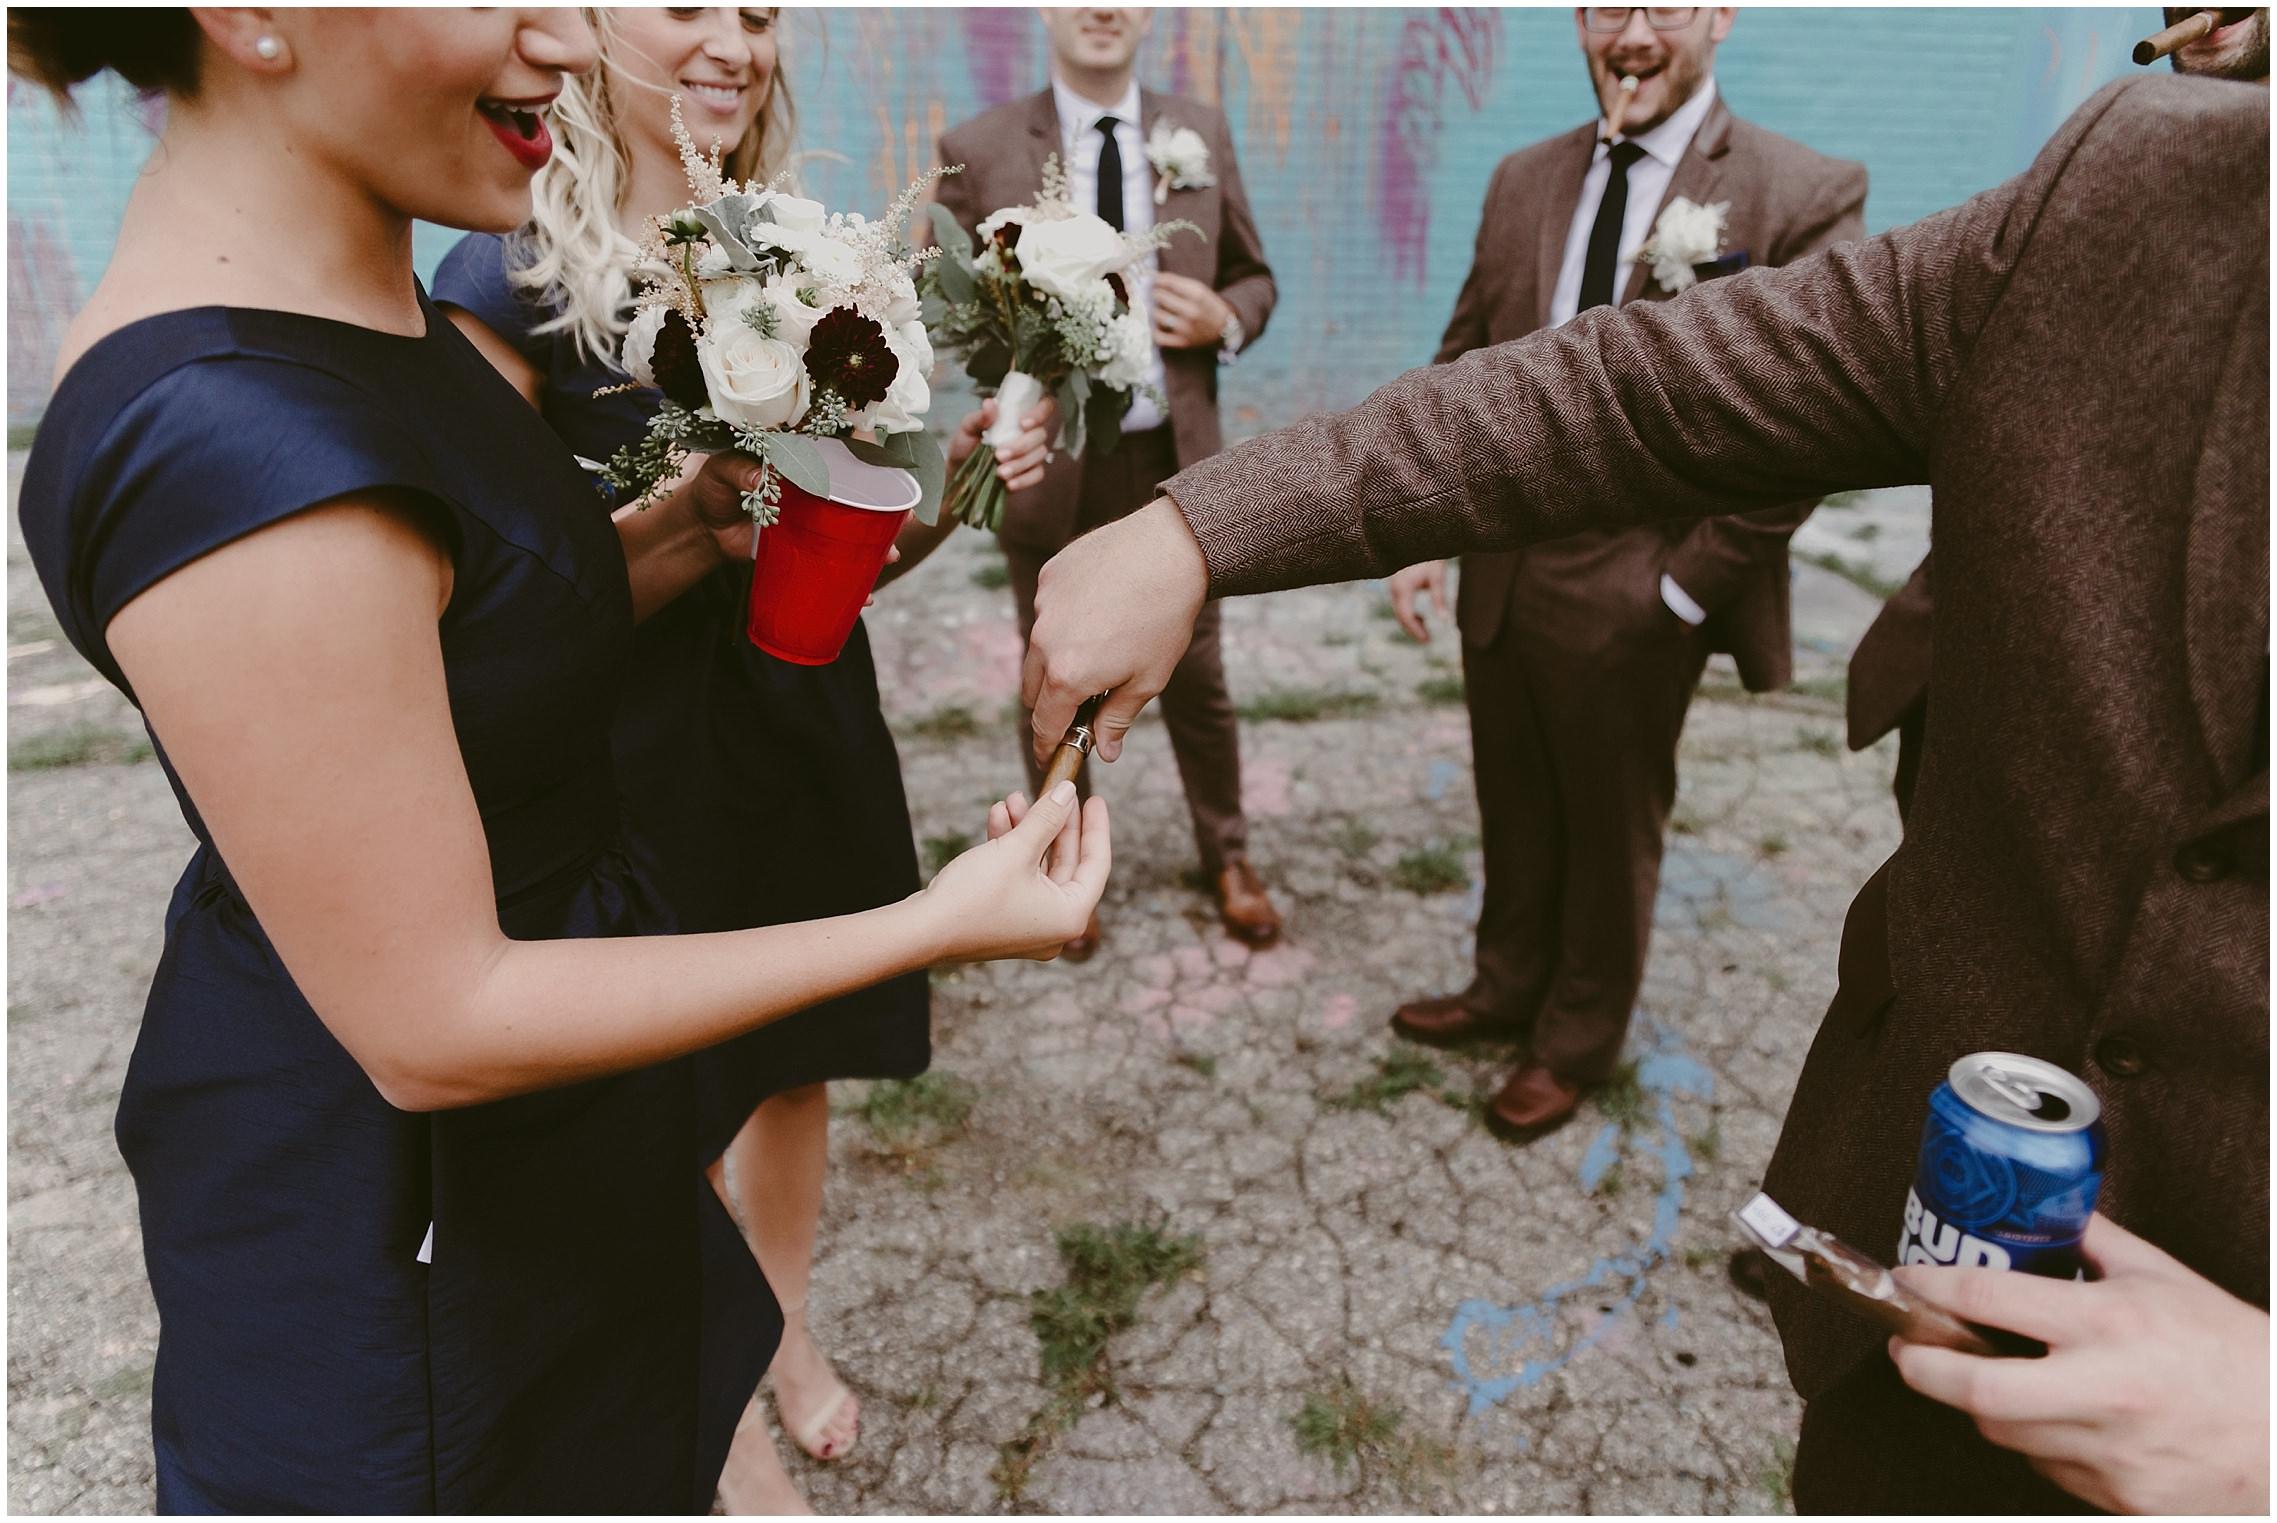 brick_and_mortar_colorado_wedding_photographer_0216.jpg